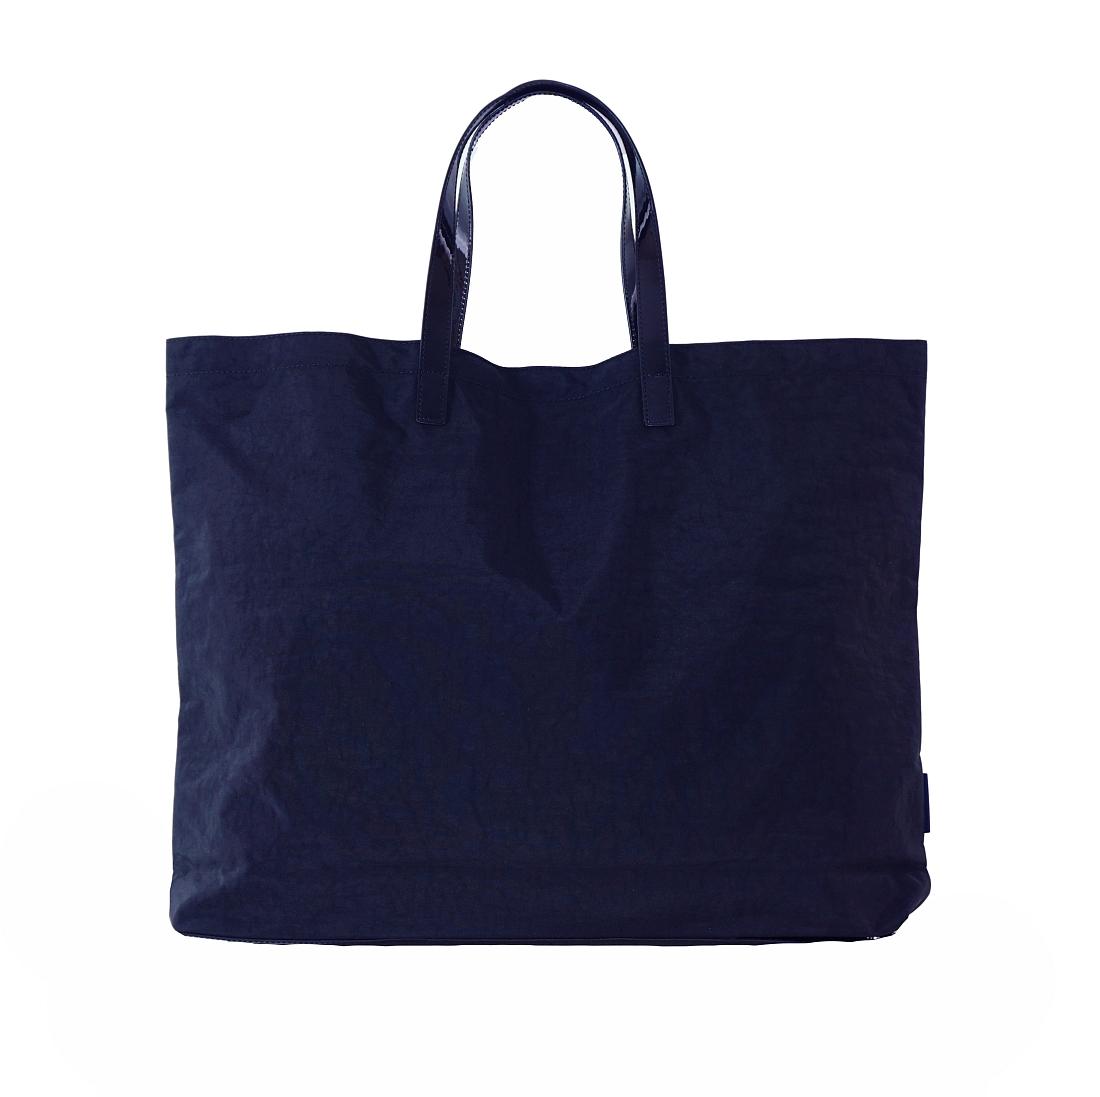 Armani Jeans Tasche Handtasche f. Damen 922552 CC861 00335 Blu HW16